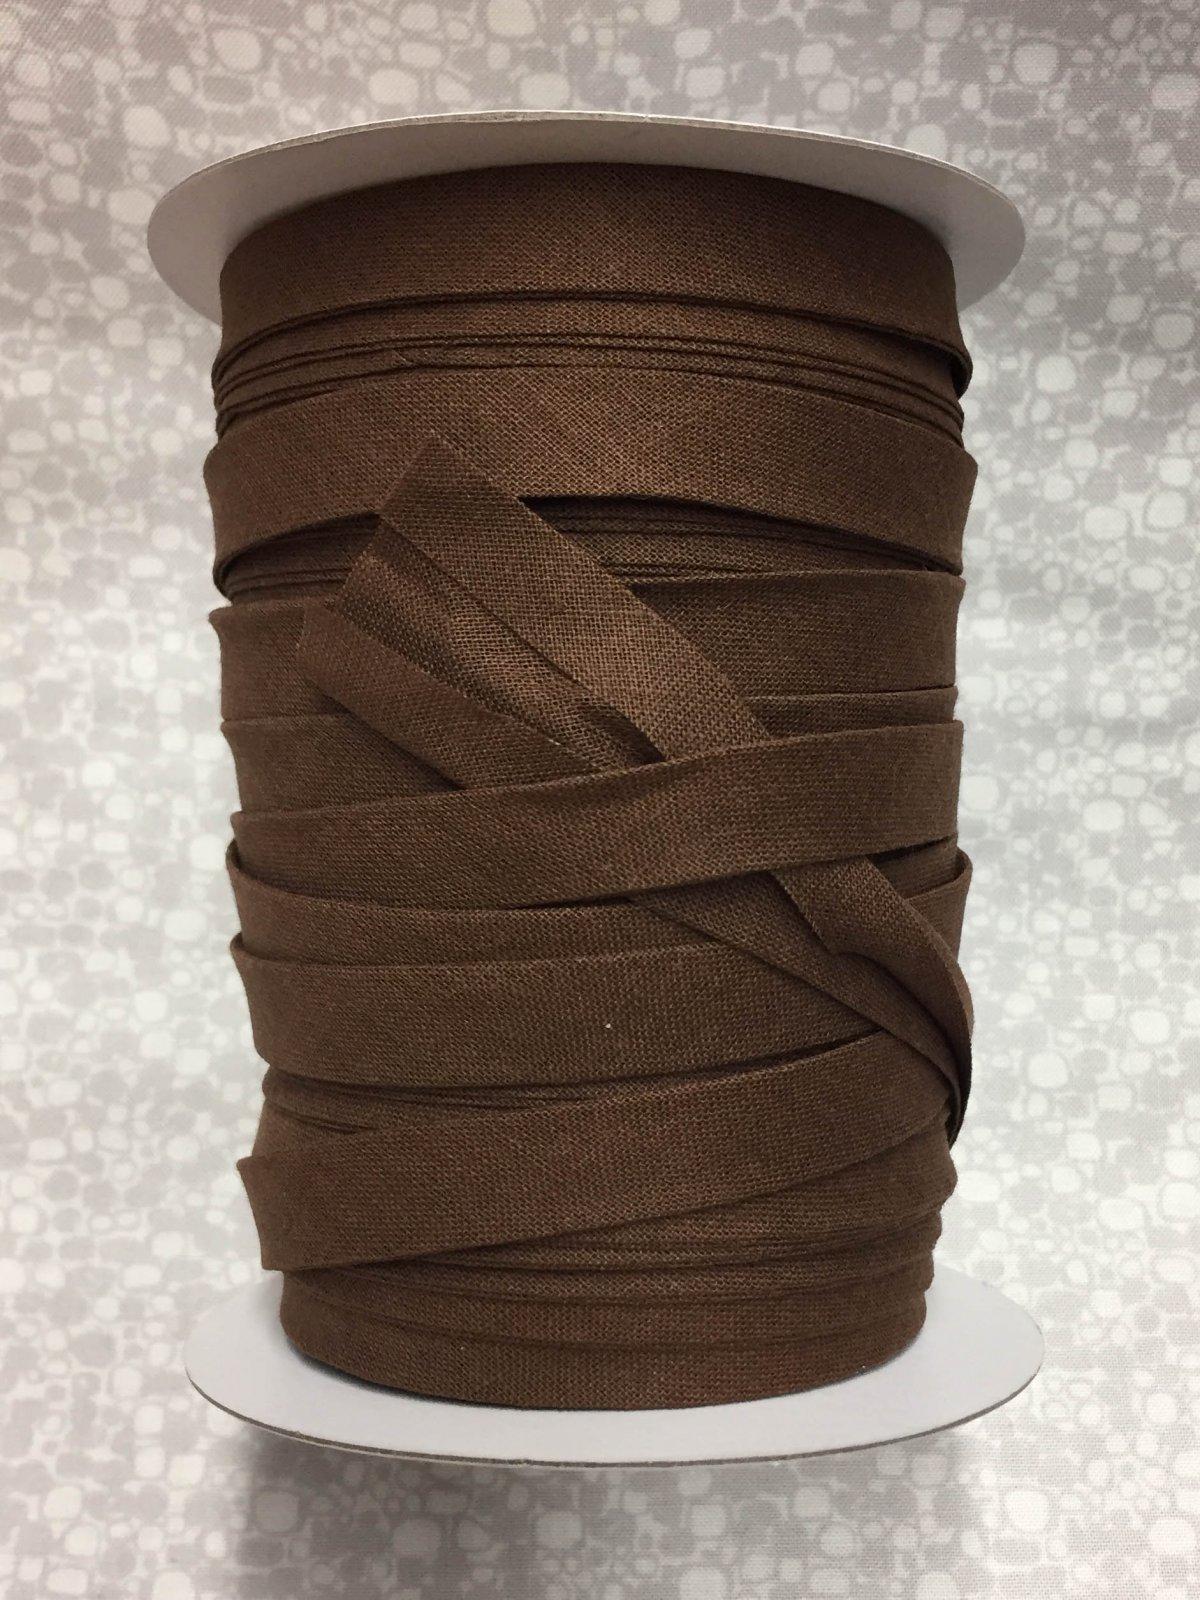 1/2 Finish Double Fold Economy Bias Binding, 10yd - Brown